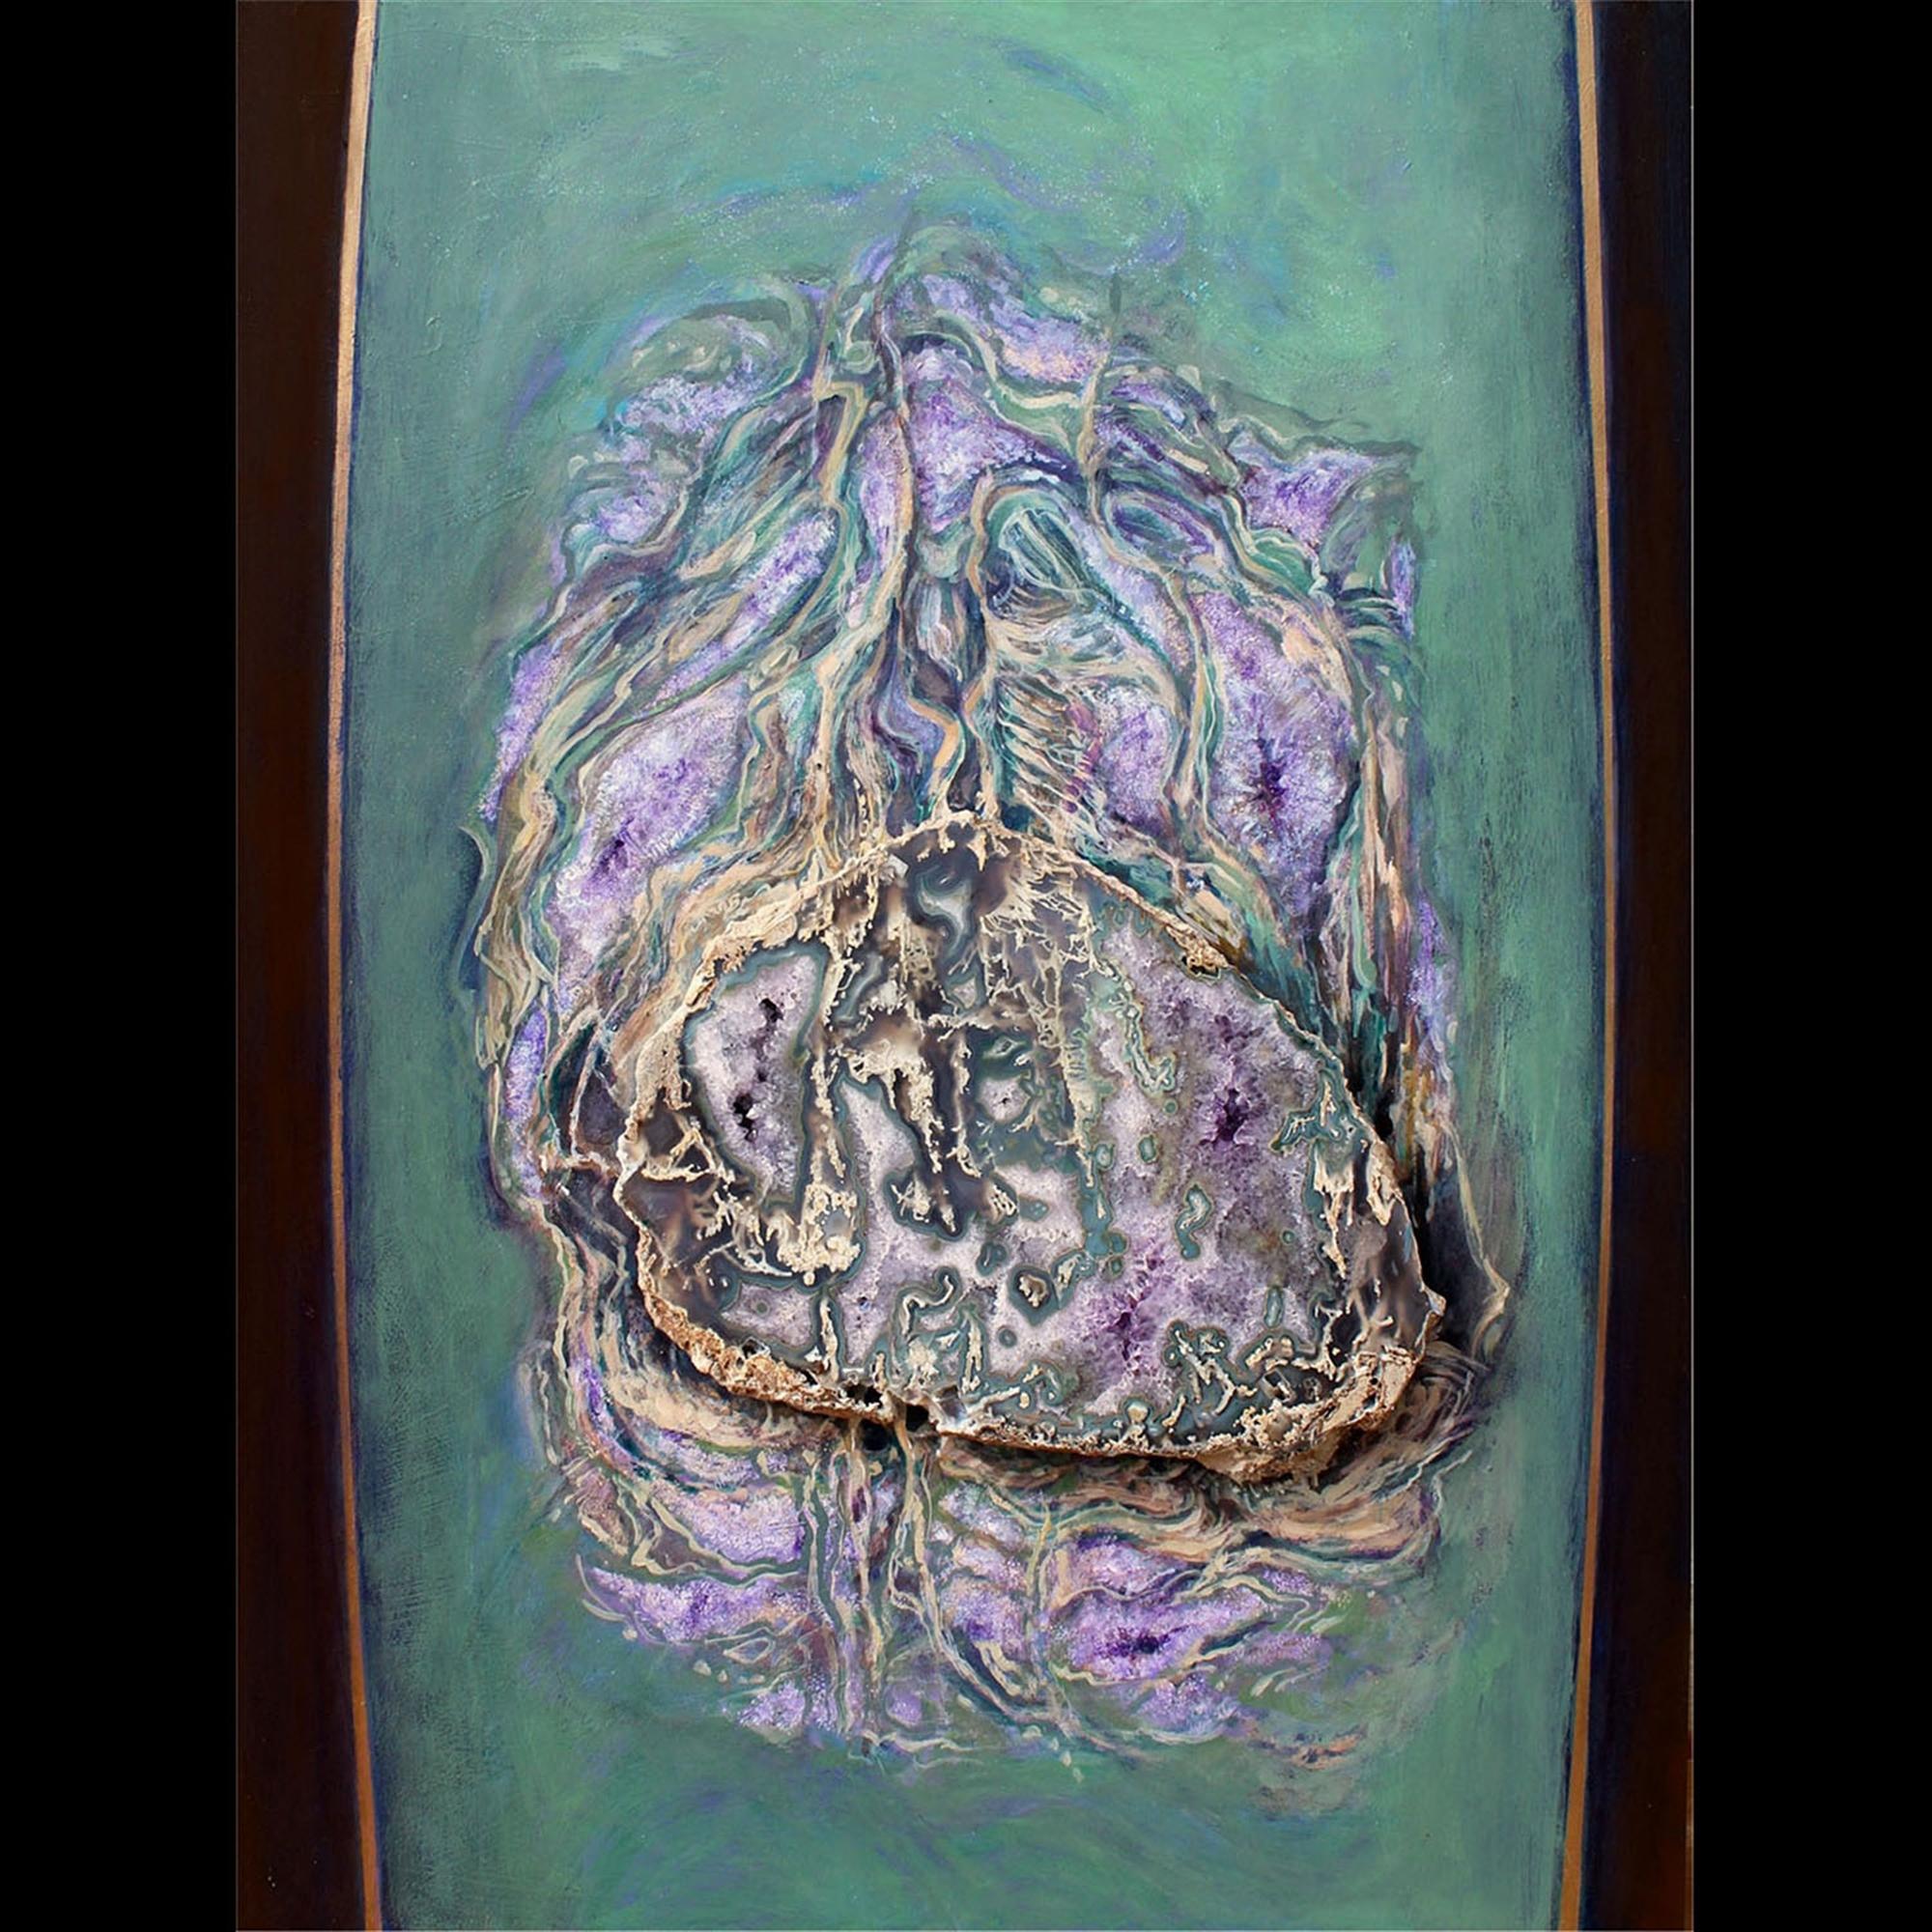 Garden of Siam by Marlys Mallét & Michael Redhawk